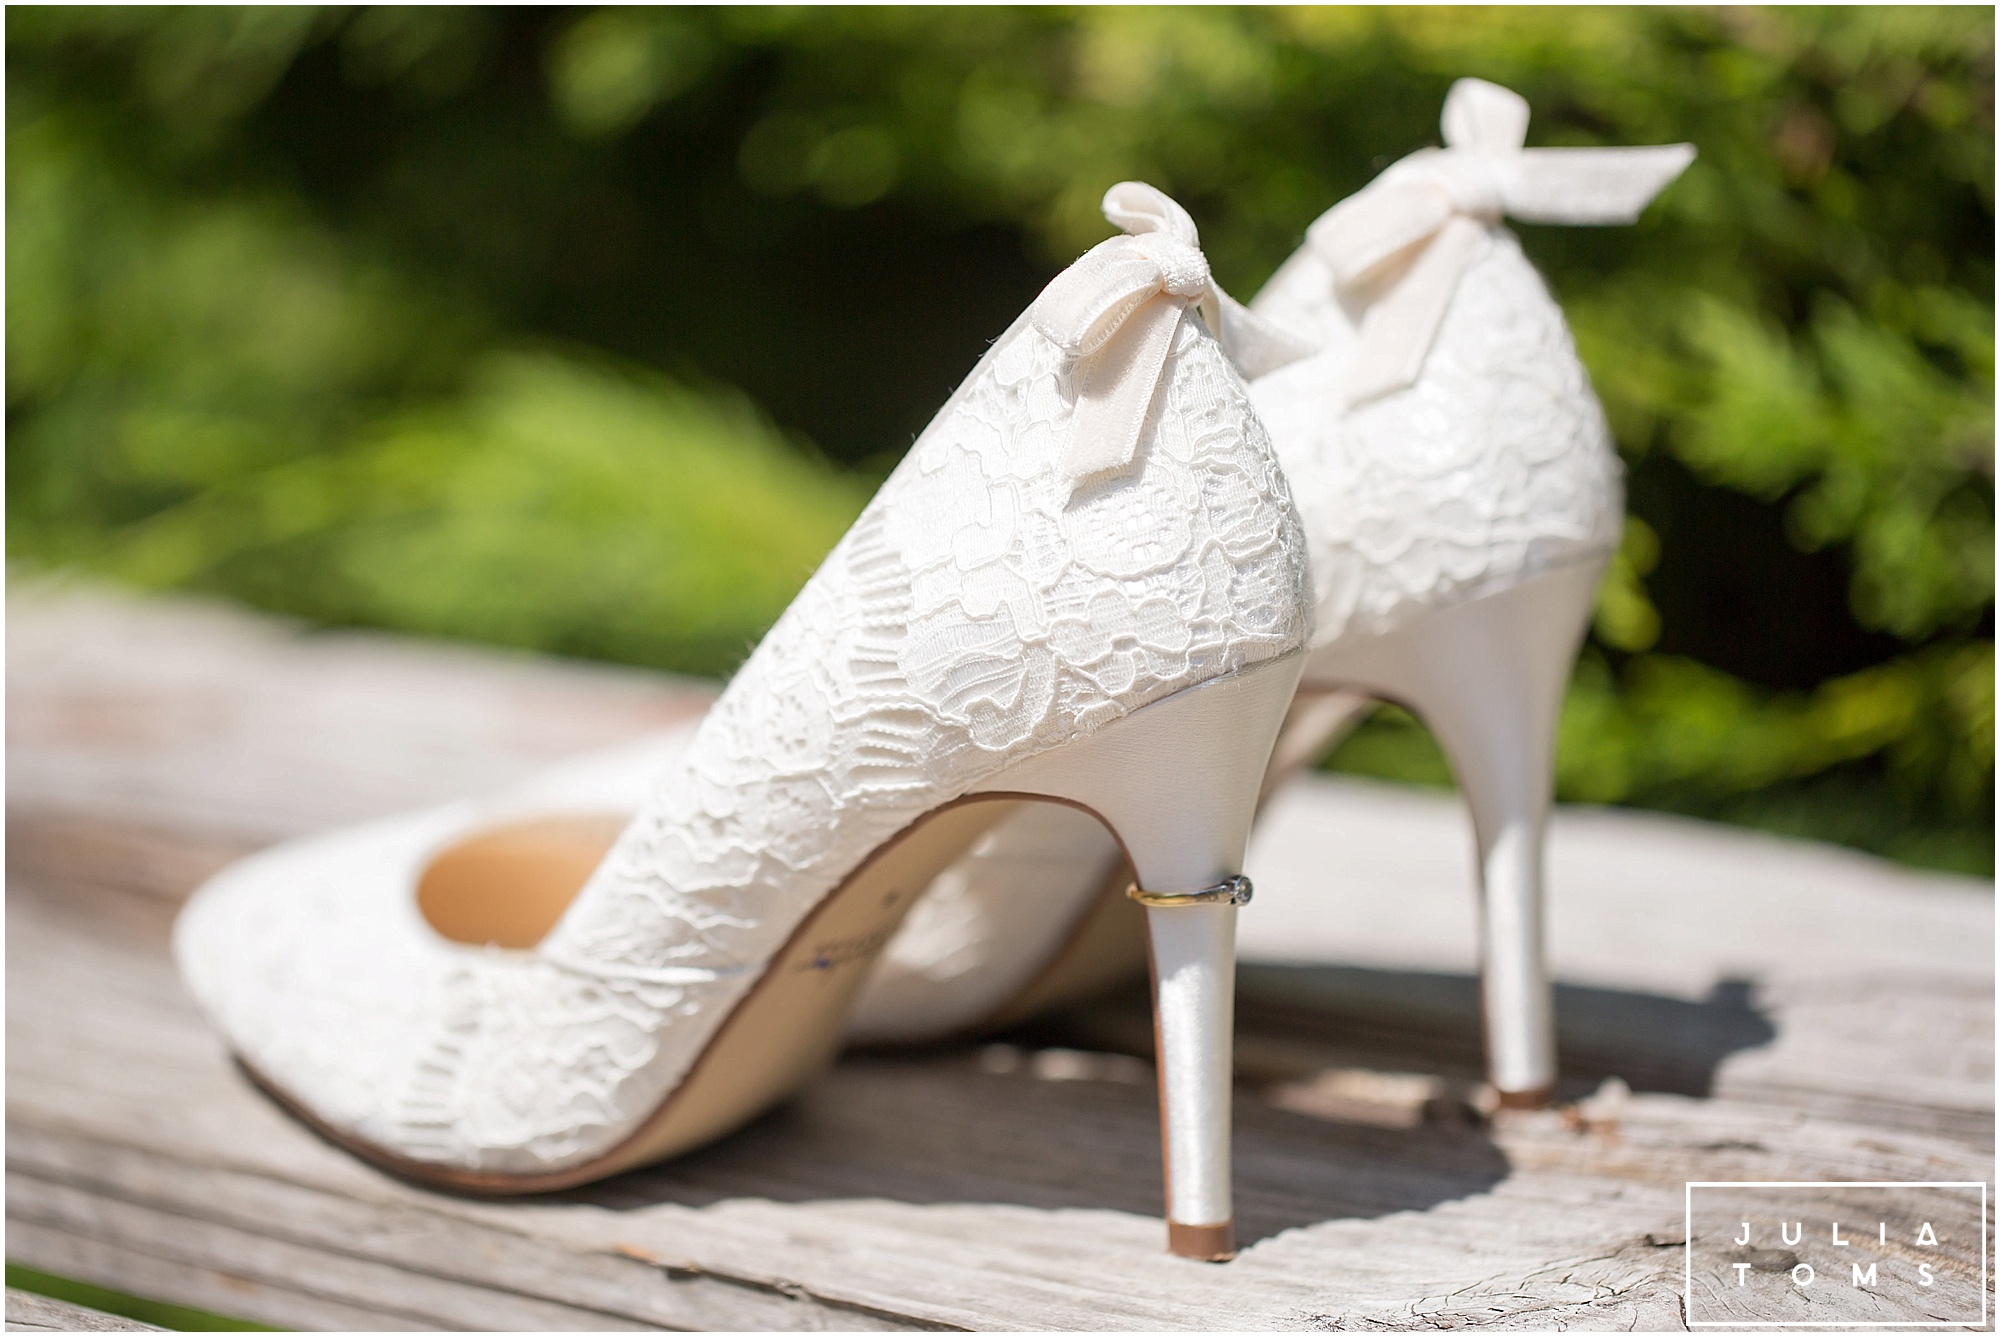 julia_toms_chichester_wedding_photographer_portsmouth_002.jpg